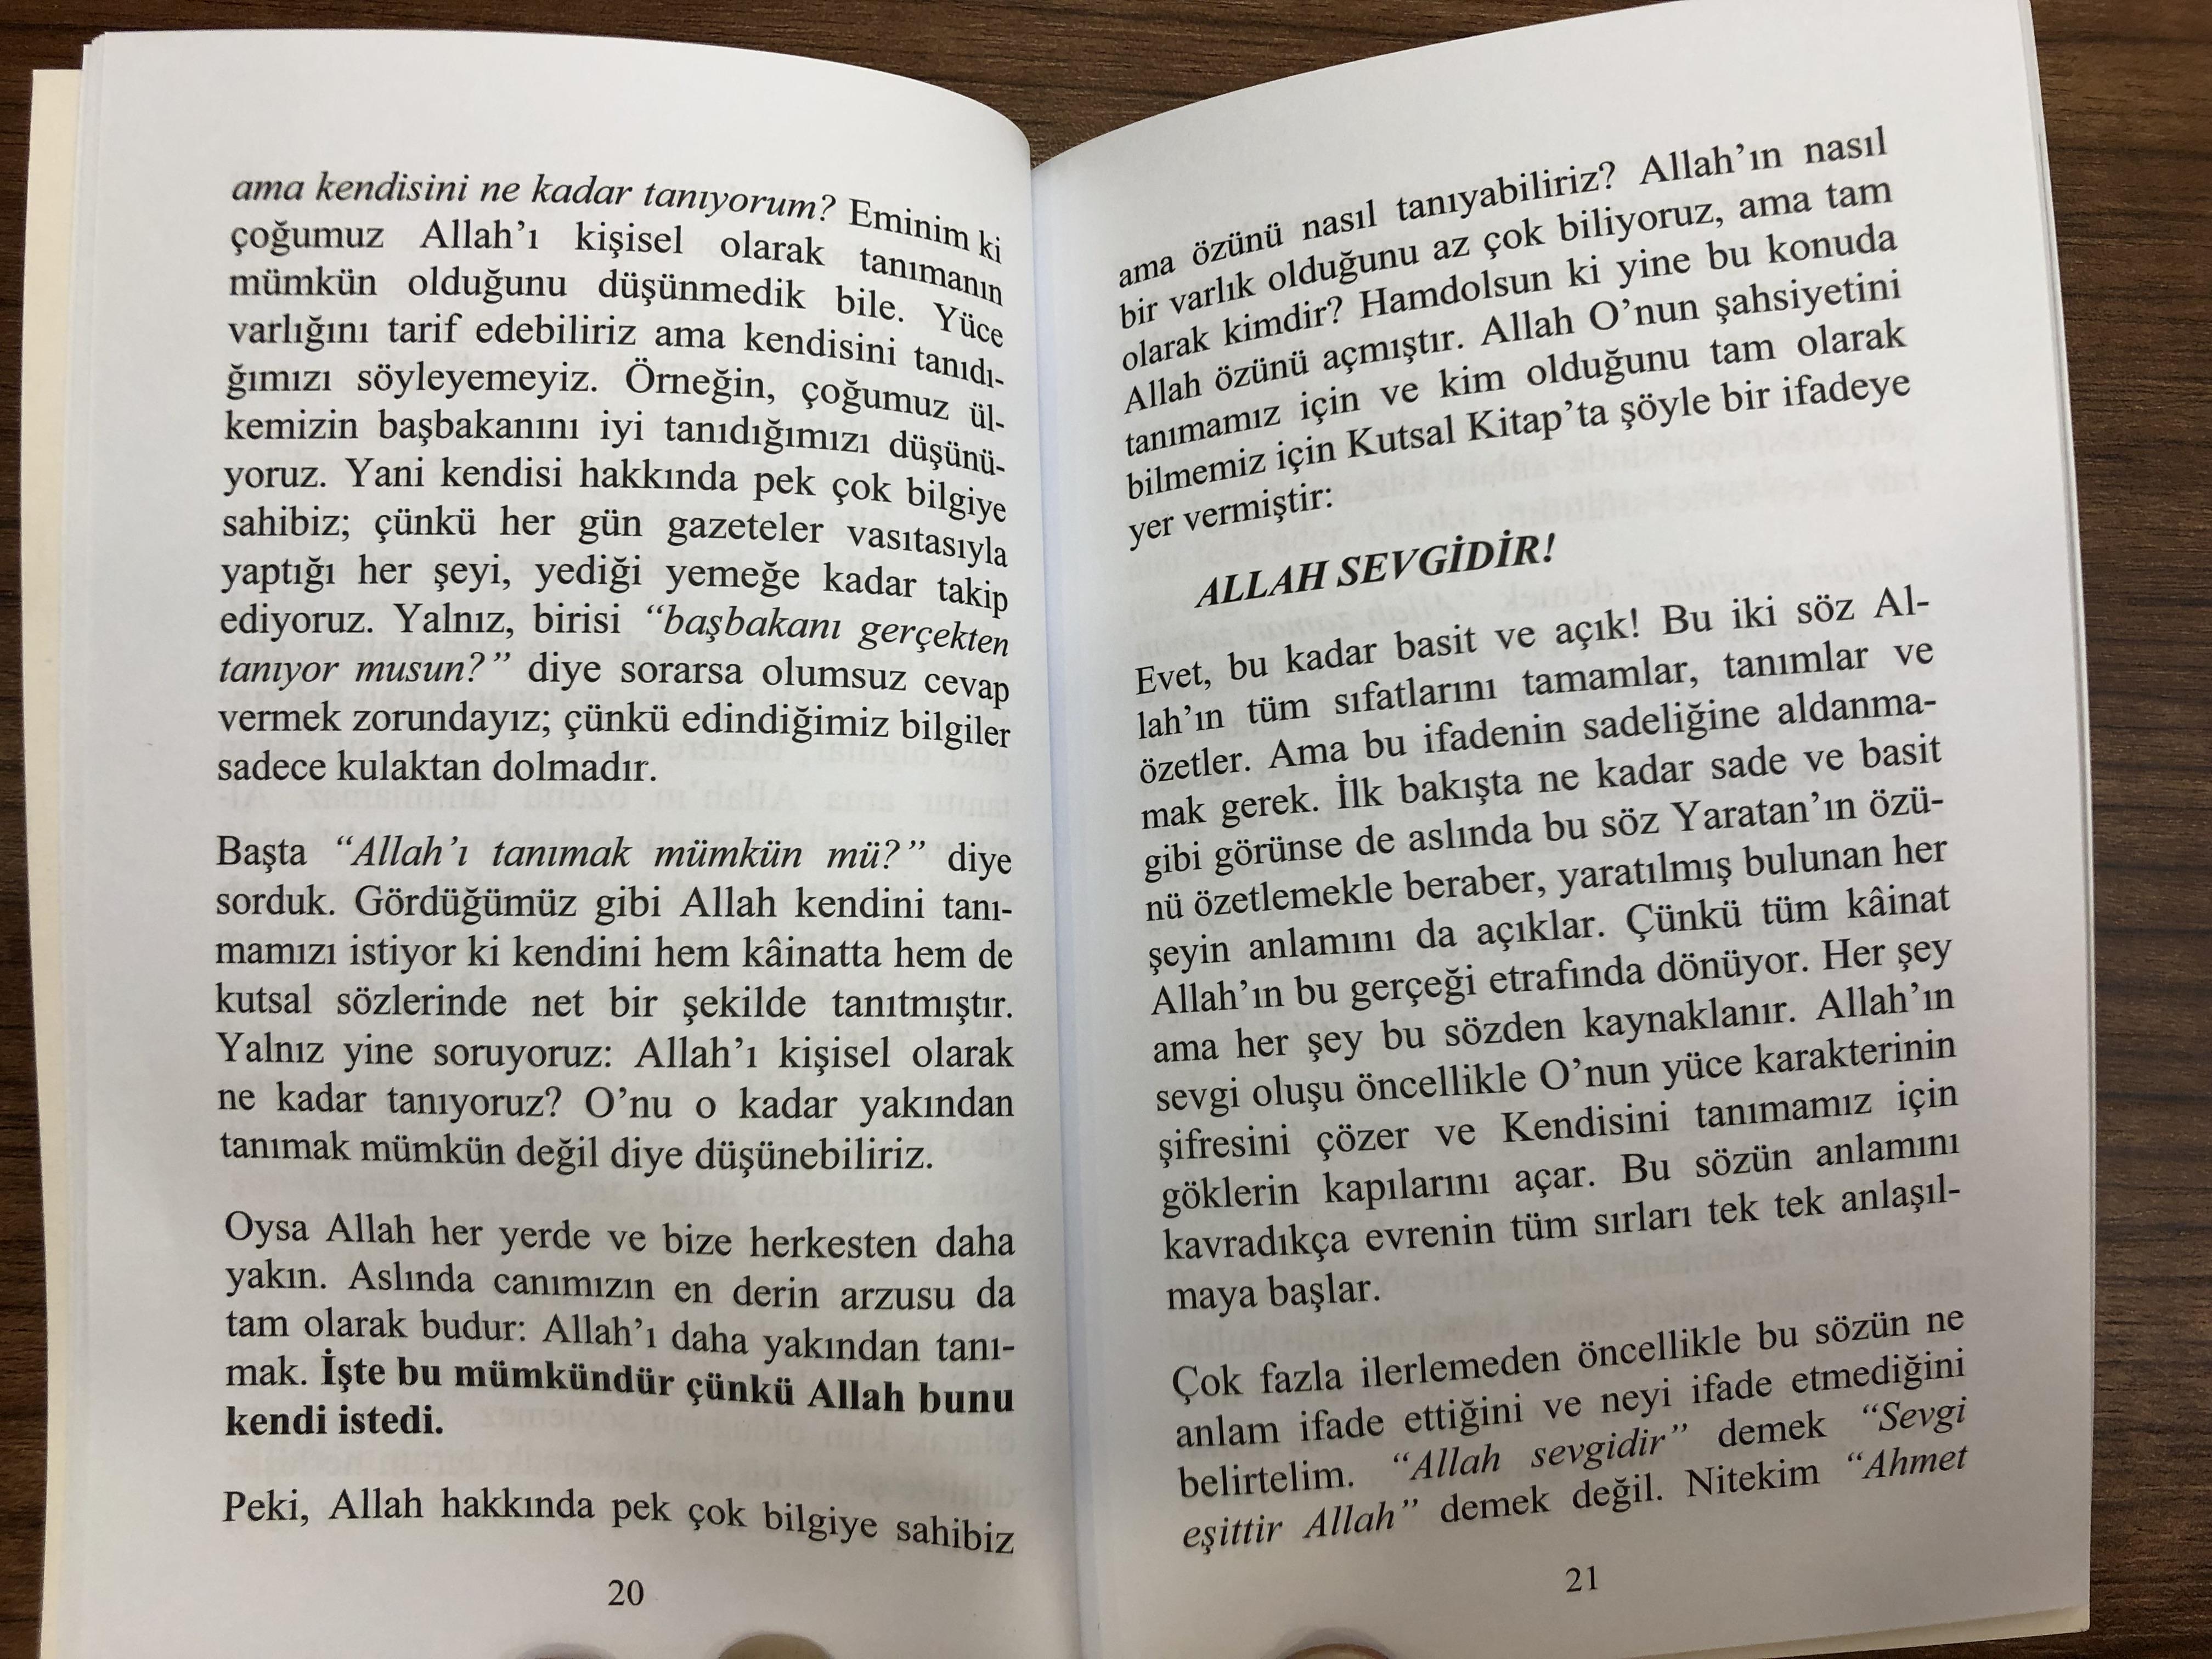 allah-sevgidir-by-can-nuroglu-1-.jpg